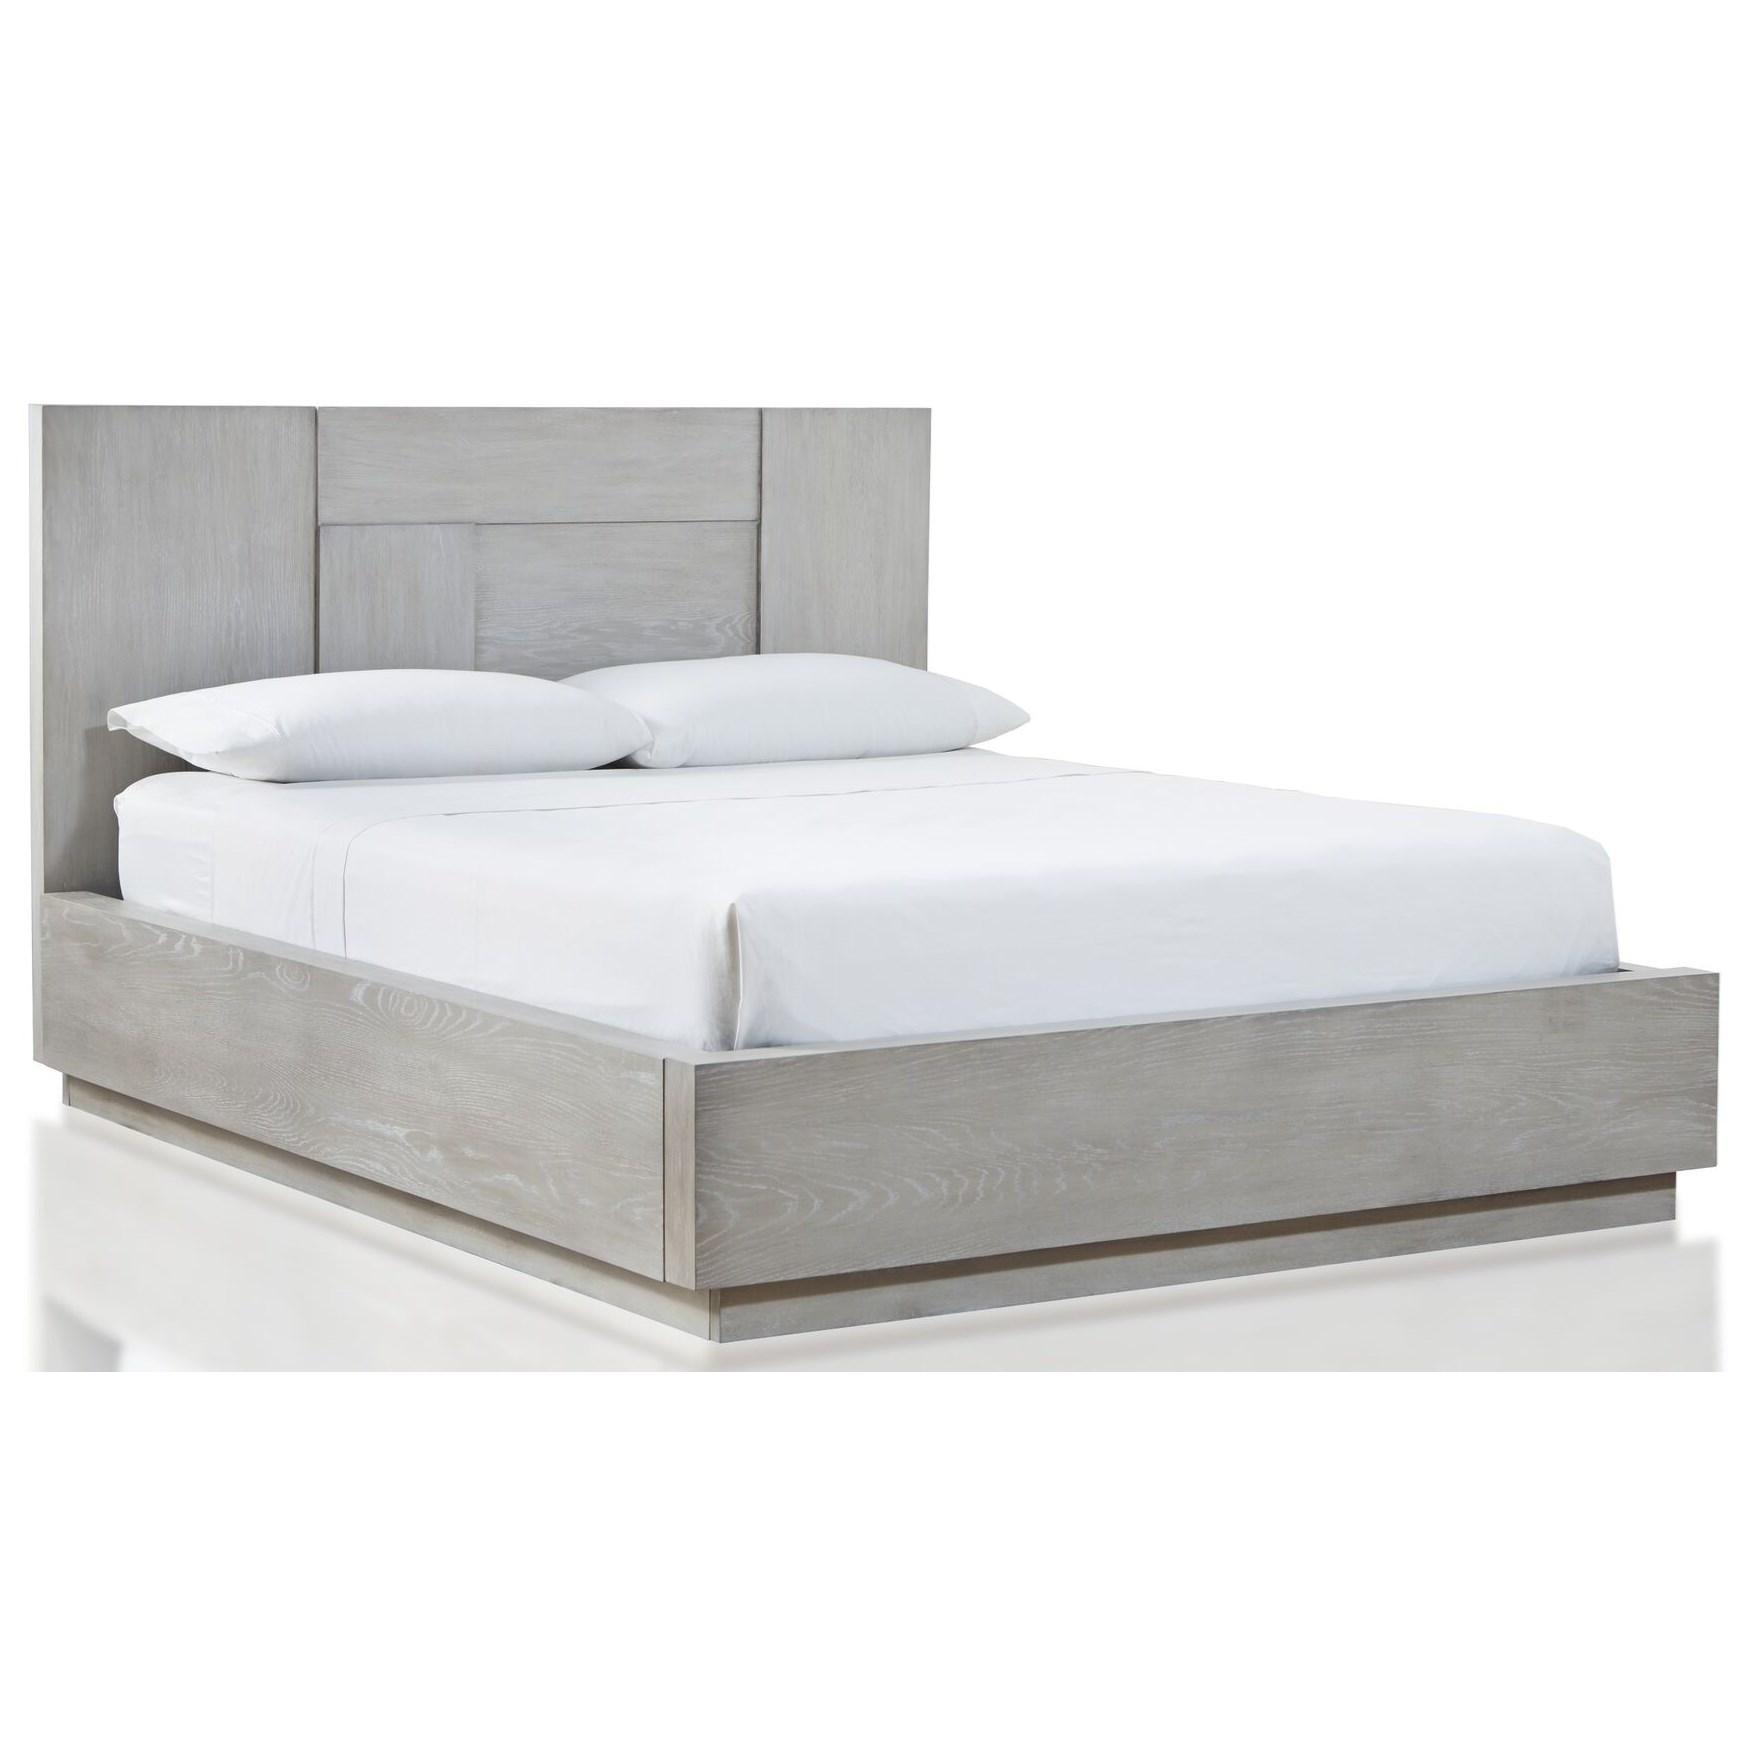 Destination California King Panel Bed by Modus International at HomeWorld Furniture